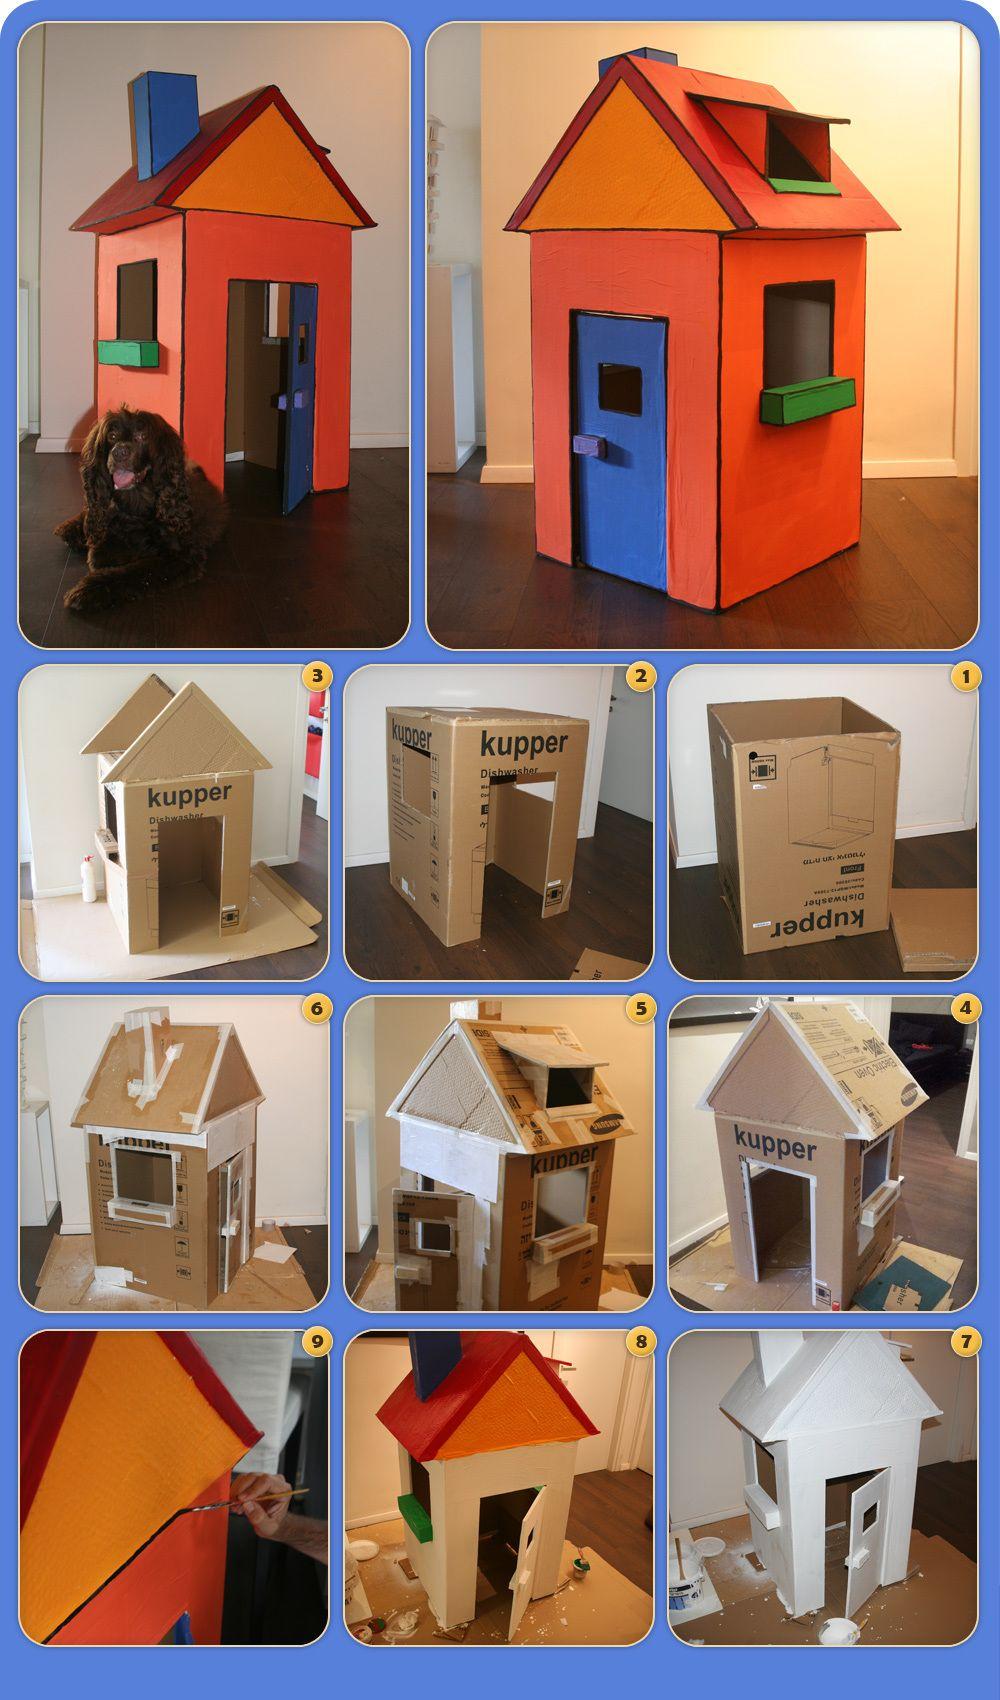 Casas de cartón para niños | Casas de cartón, Cartón y Para niños